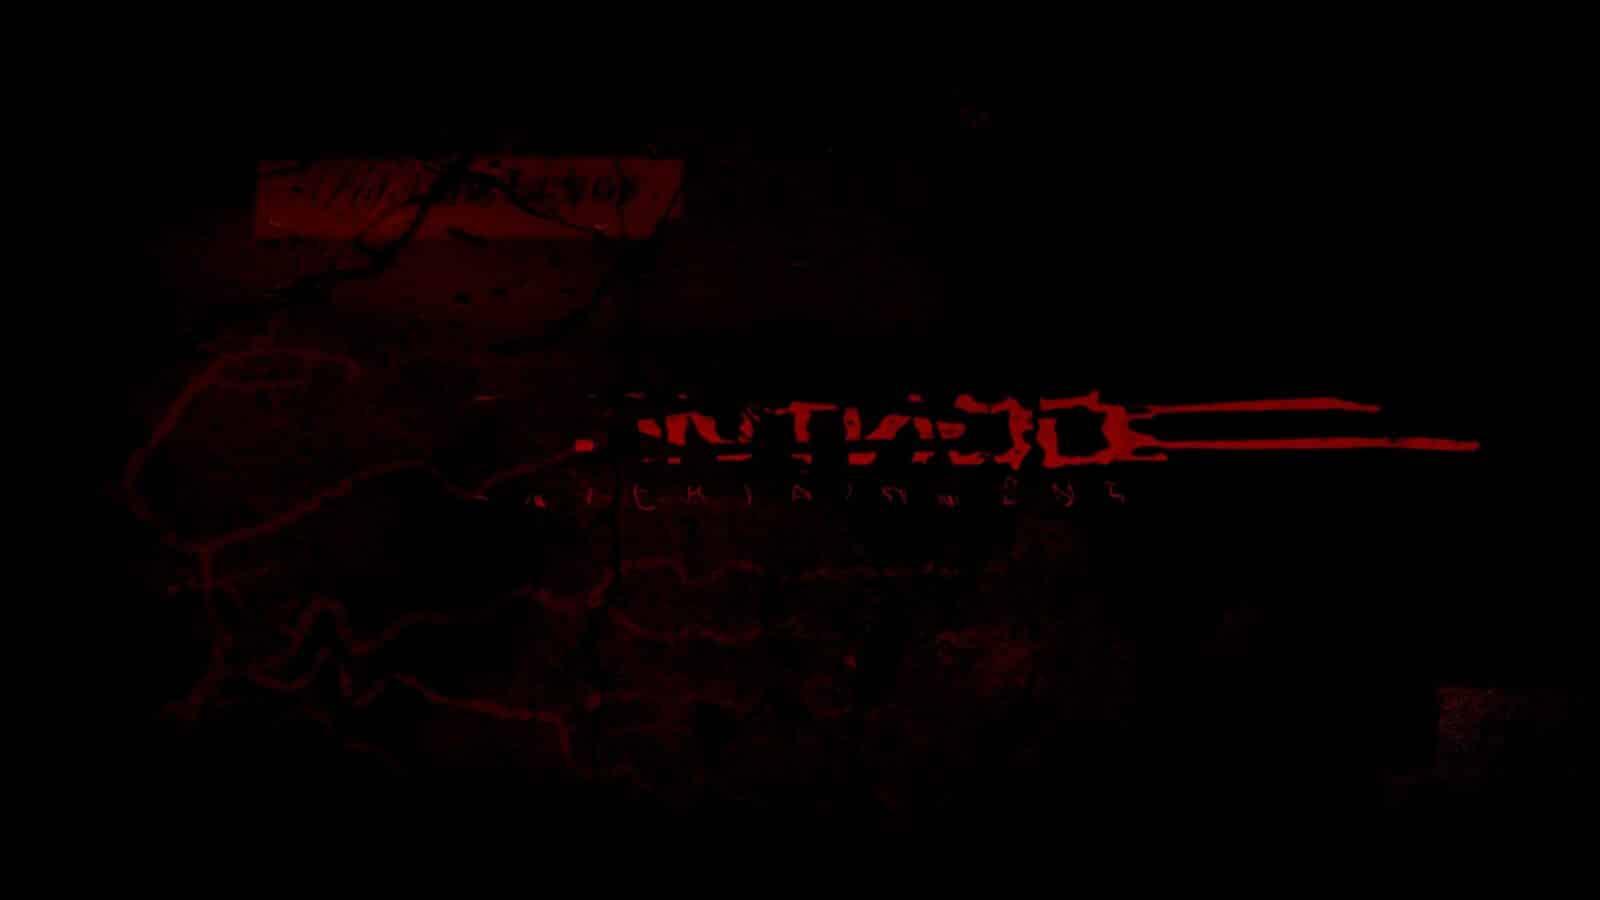 Vampyr_26-Le logo Dontnod vampirisé